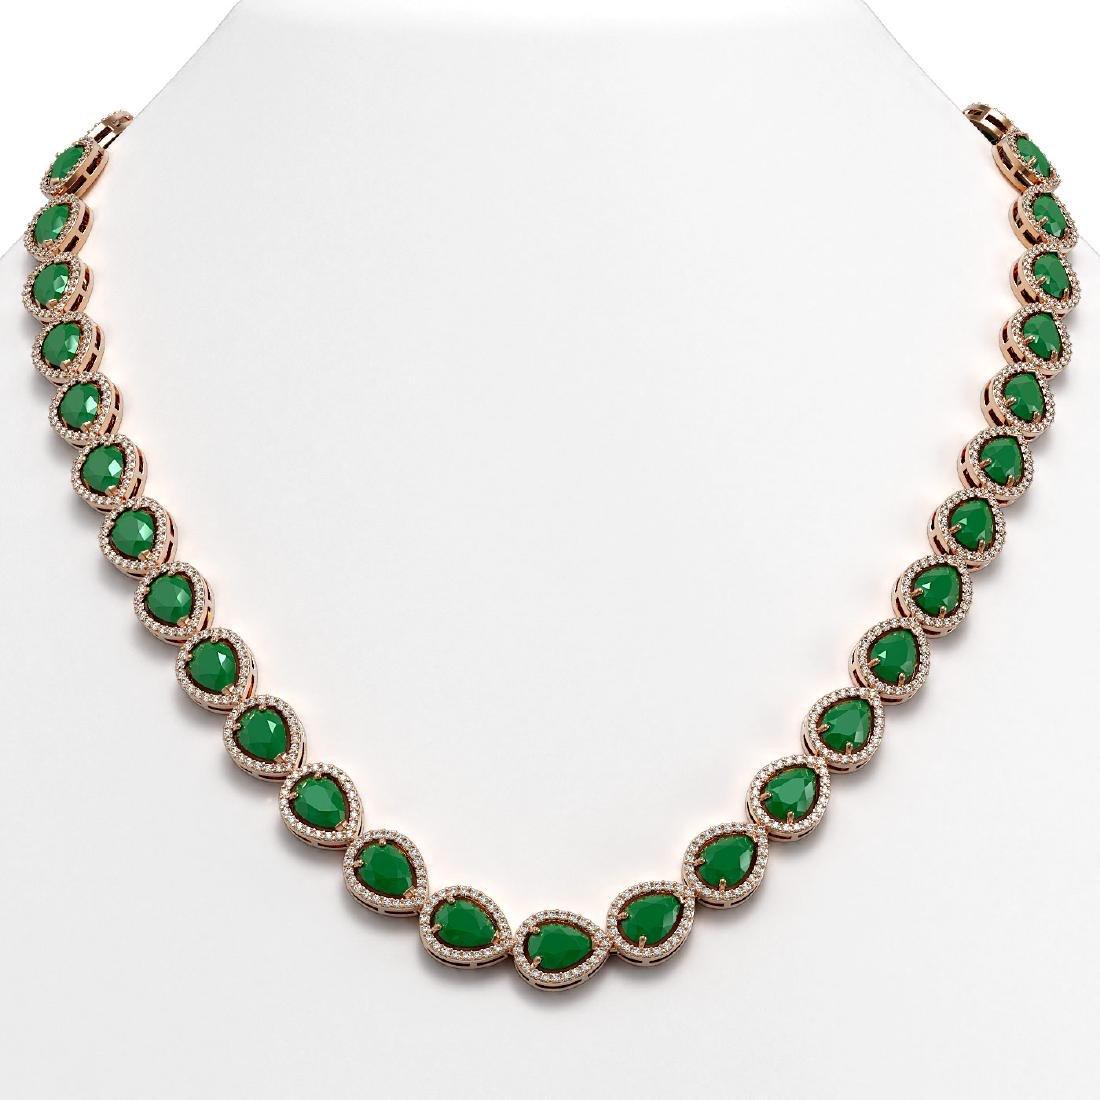 45.93 CTW Emerald & Diamond Halo Necklace 10K Rose Gold